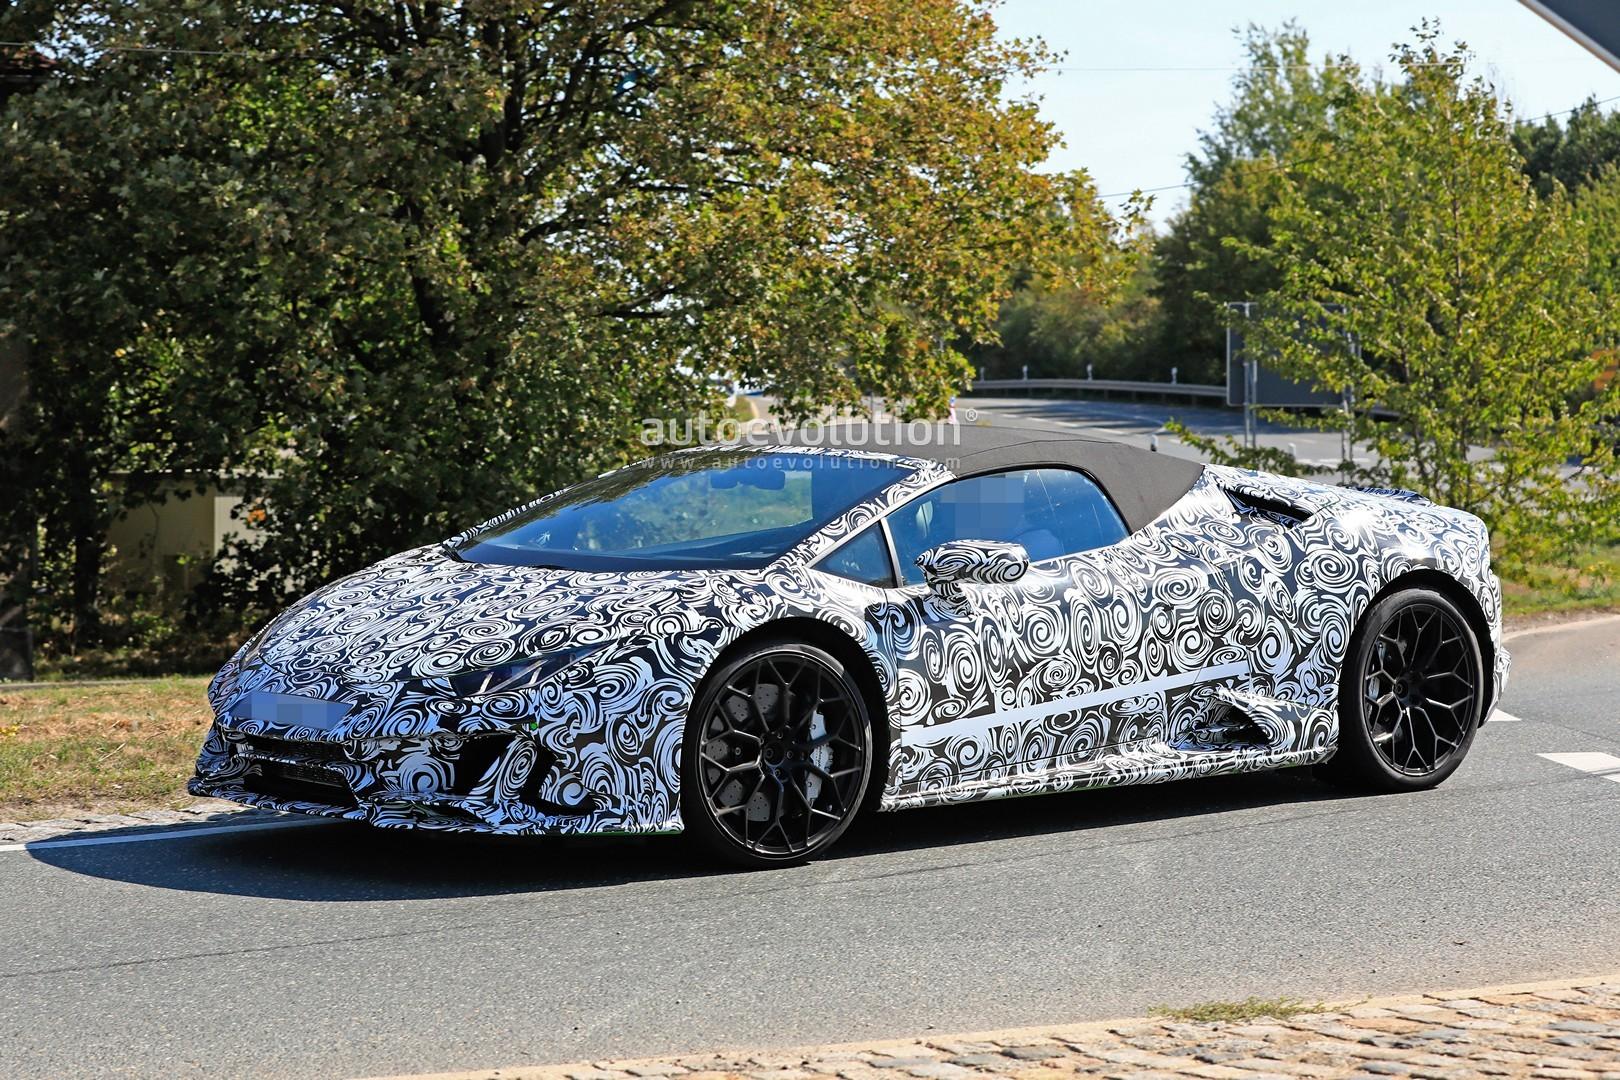 2020 Lamborghini Huracan Spyder Facelift Makes Spyshots Debut - autoevolution